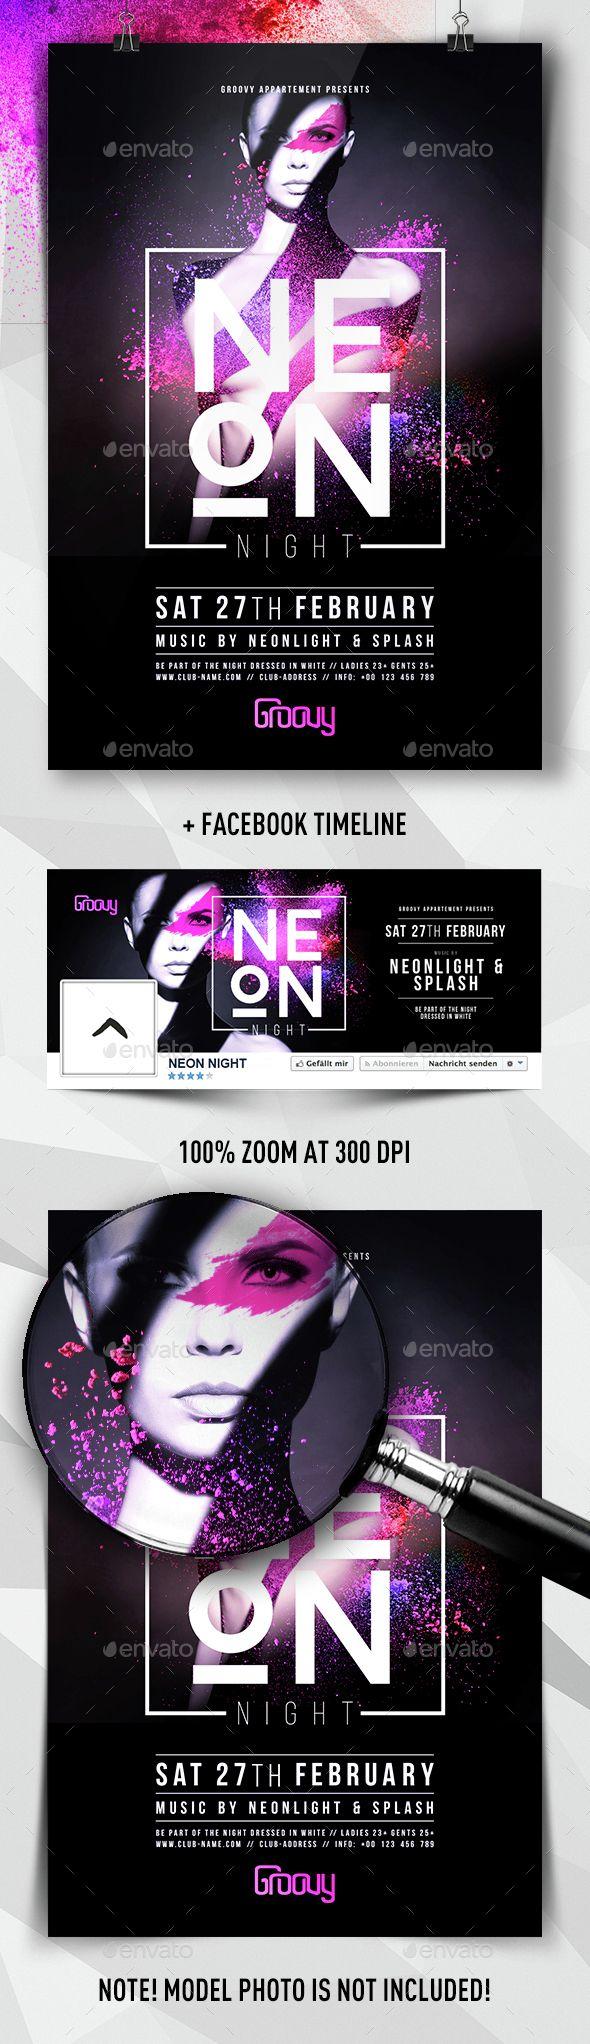 Neon Night Flyer Template PSD. Download here: http://graphicriver.net/item/neon-night-flyer/14679590?ref=ksioks